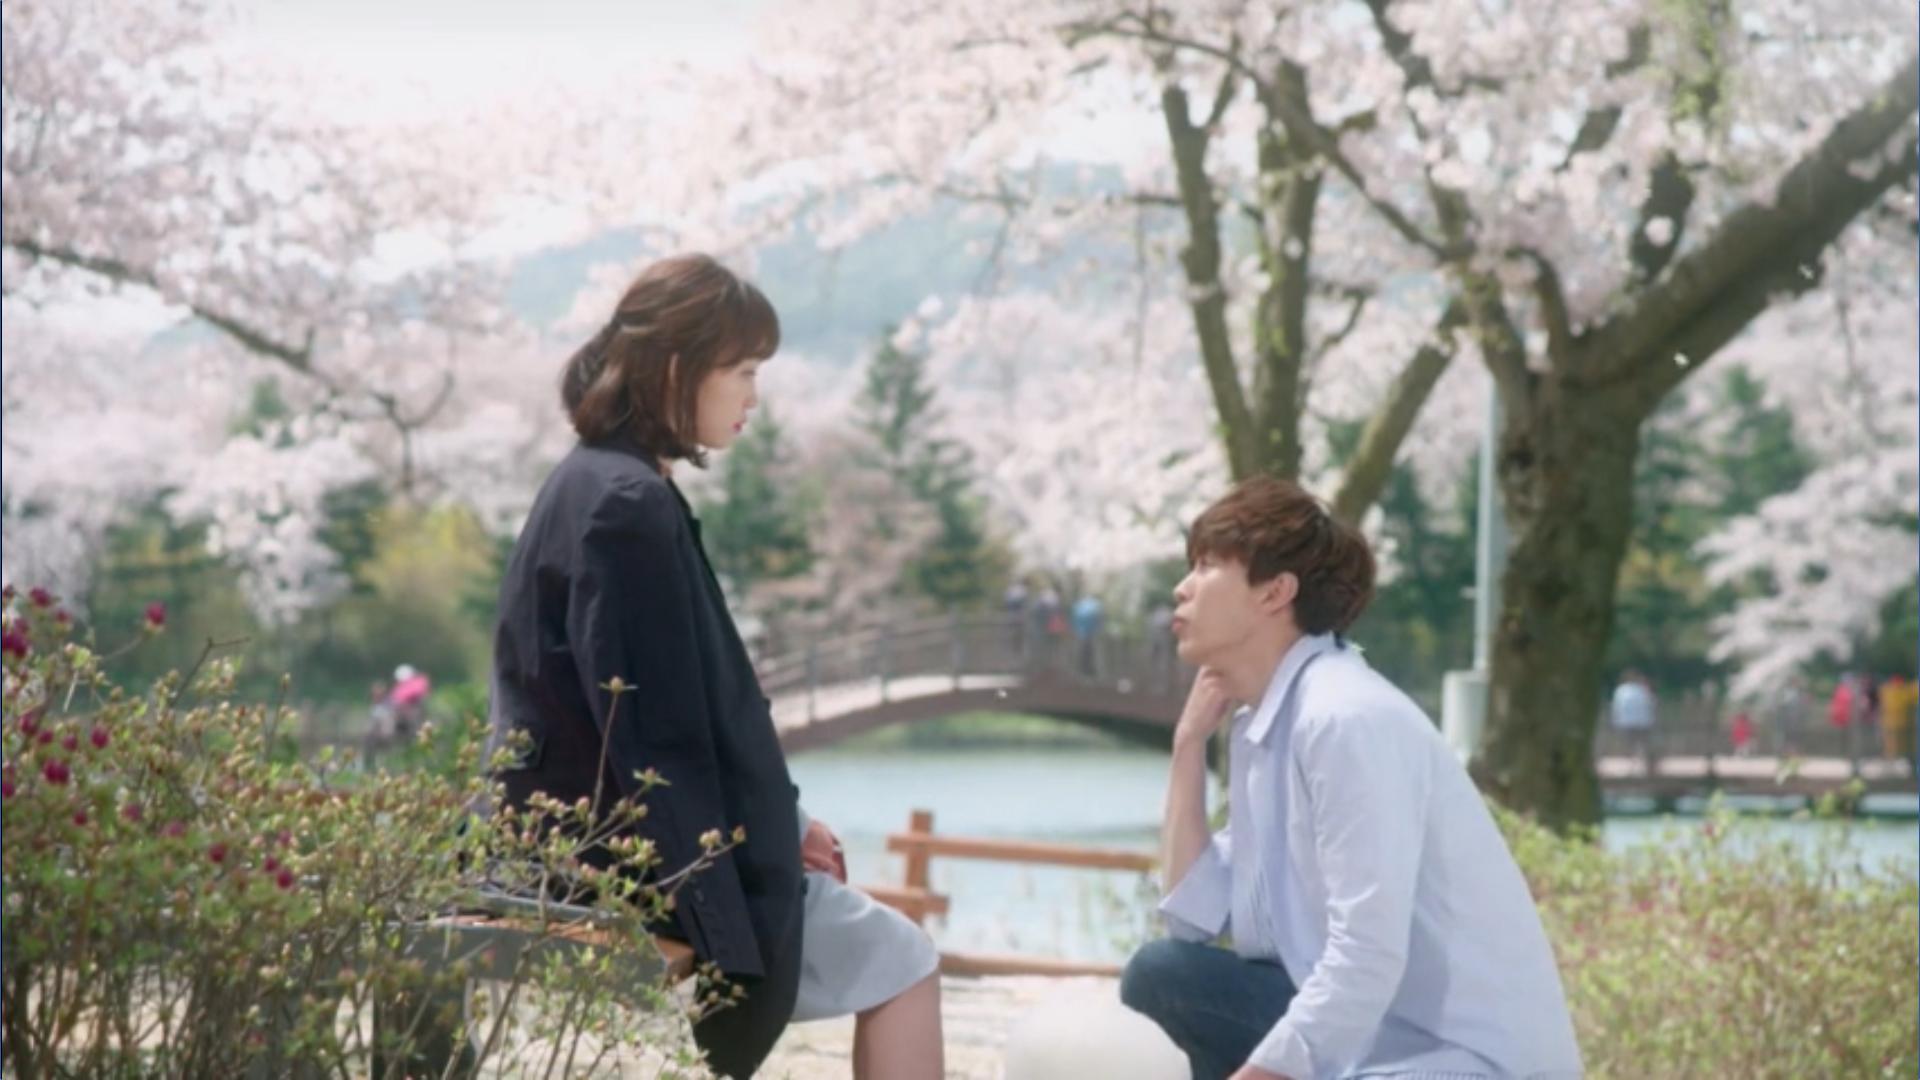 Wednesday 3:30 PM Yoon Jae-won and Seon Eun-woo at cherry blossom